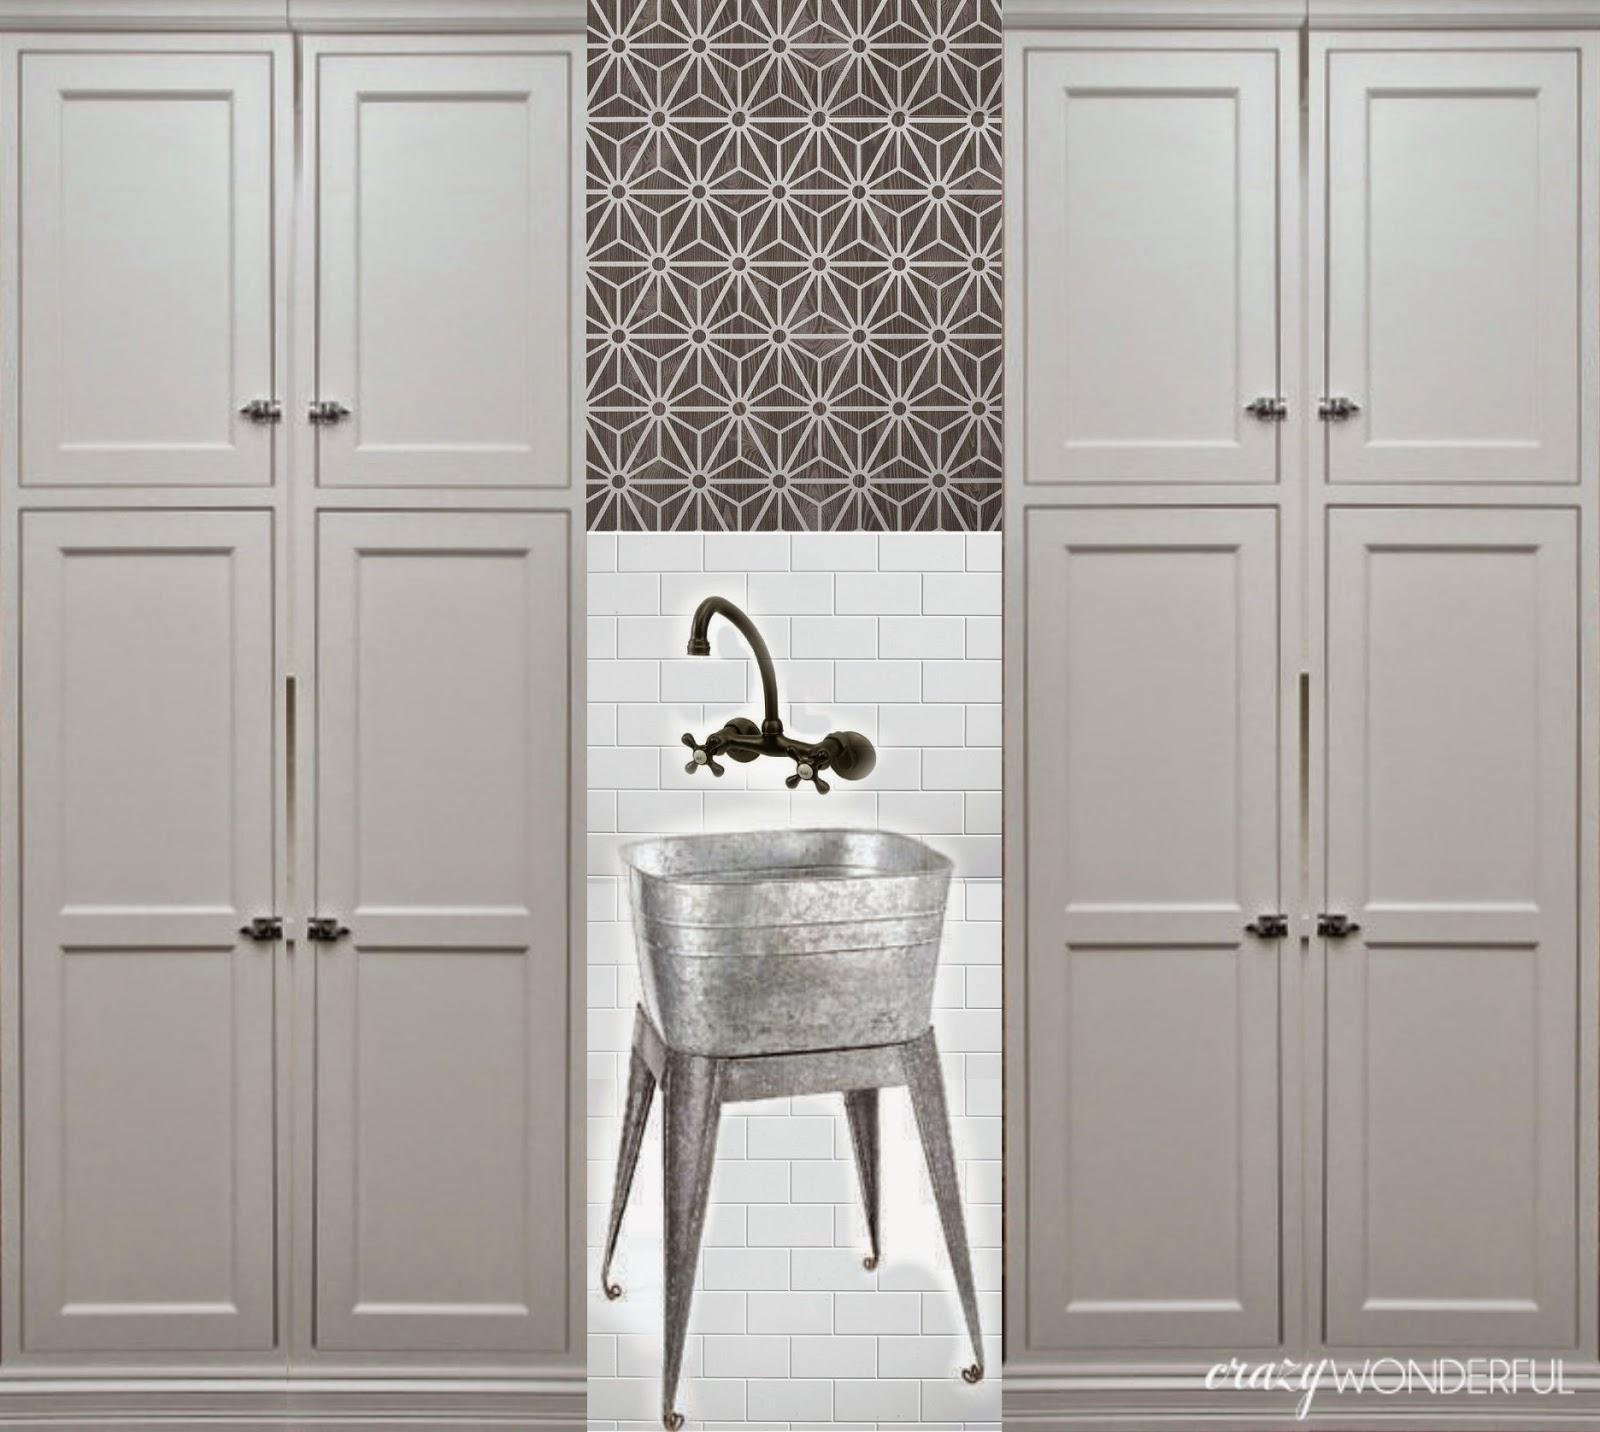 Laundry Room Cabinet Plans - jumpstationx.com